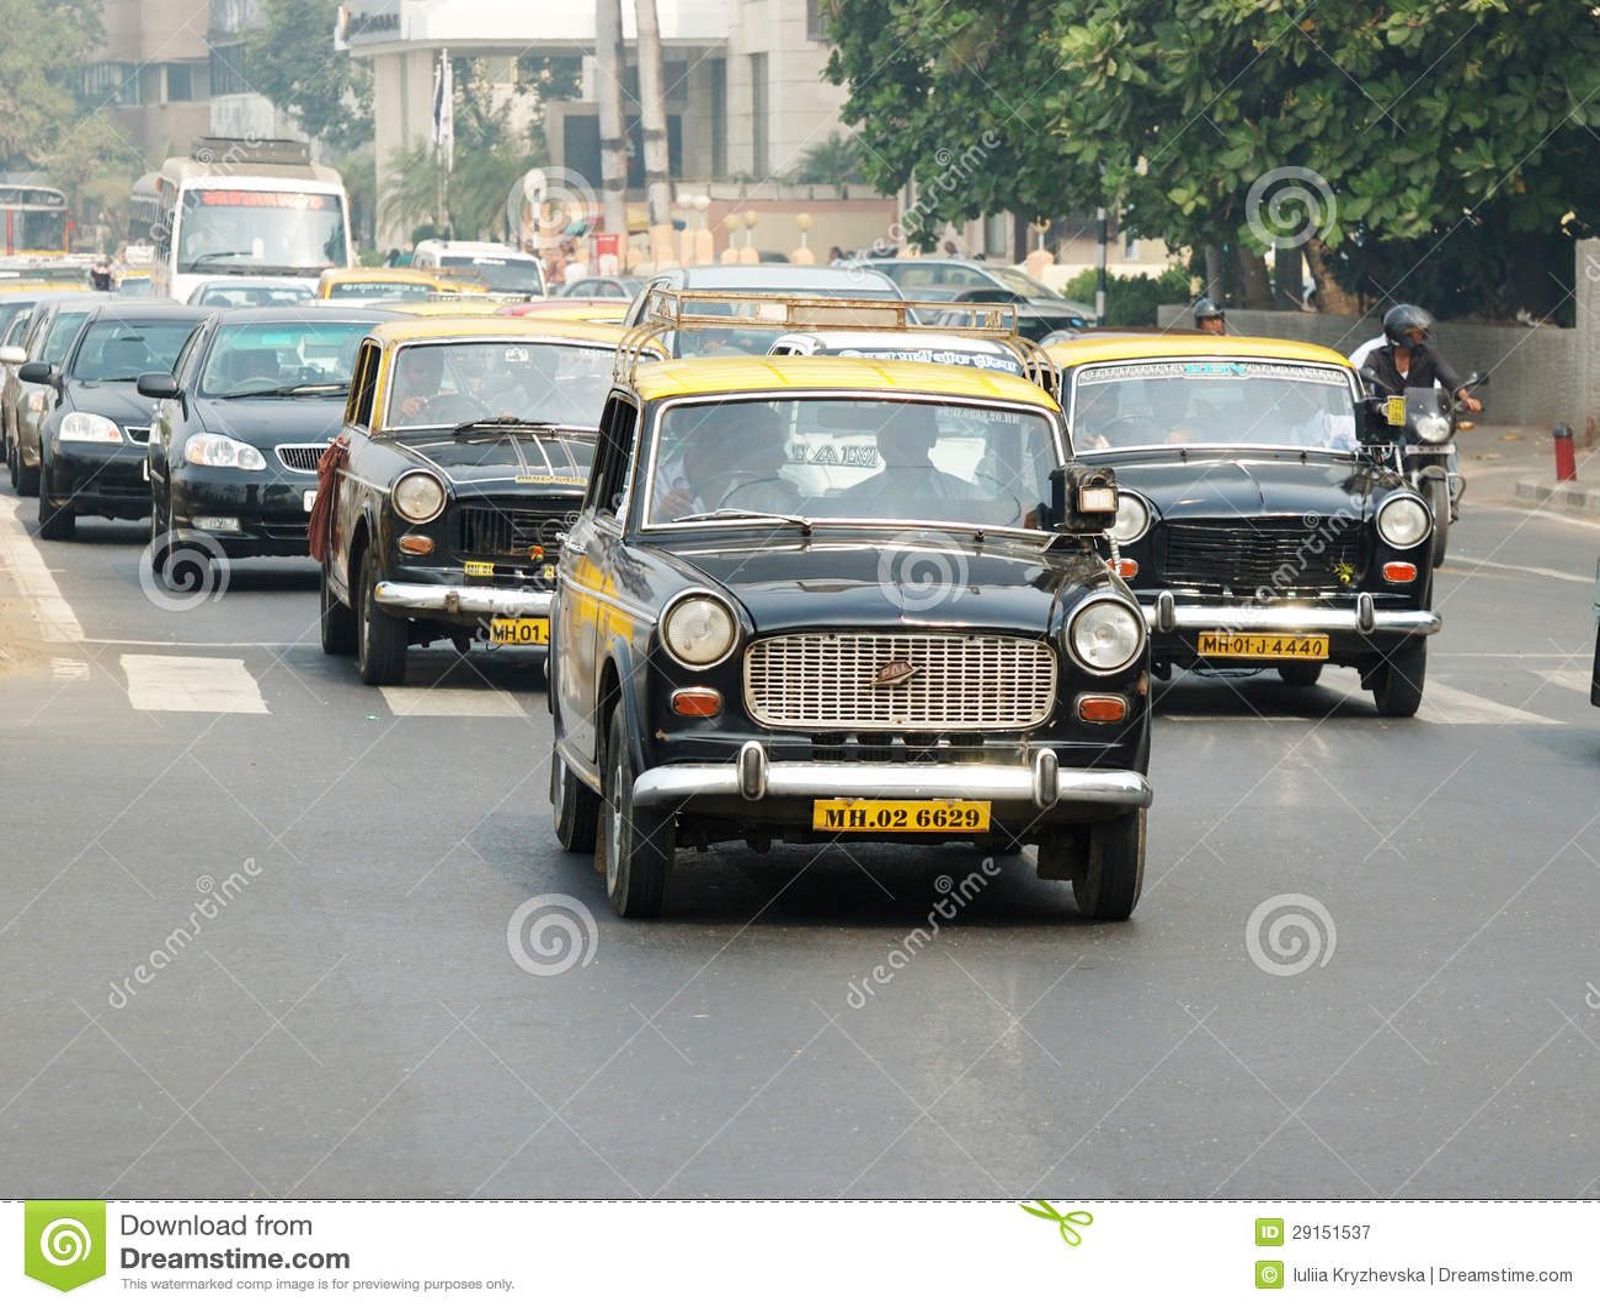 Mumbai traffic with several classical ambassador cabs,India